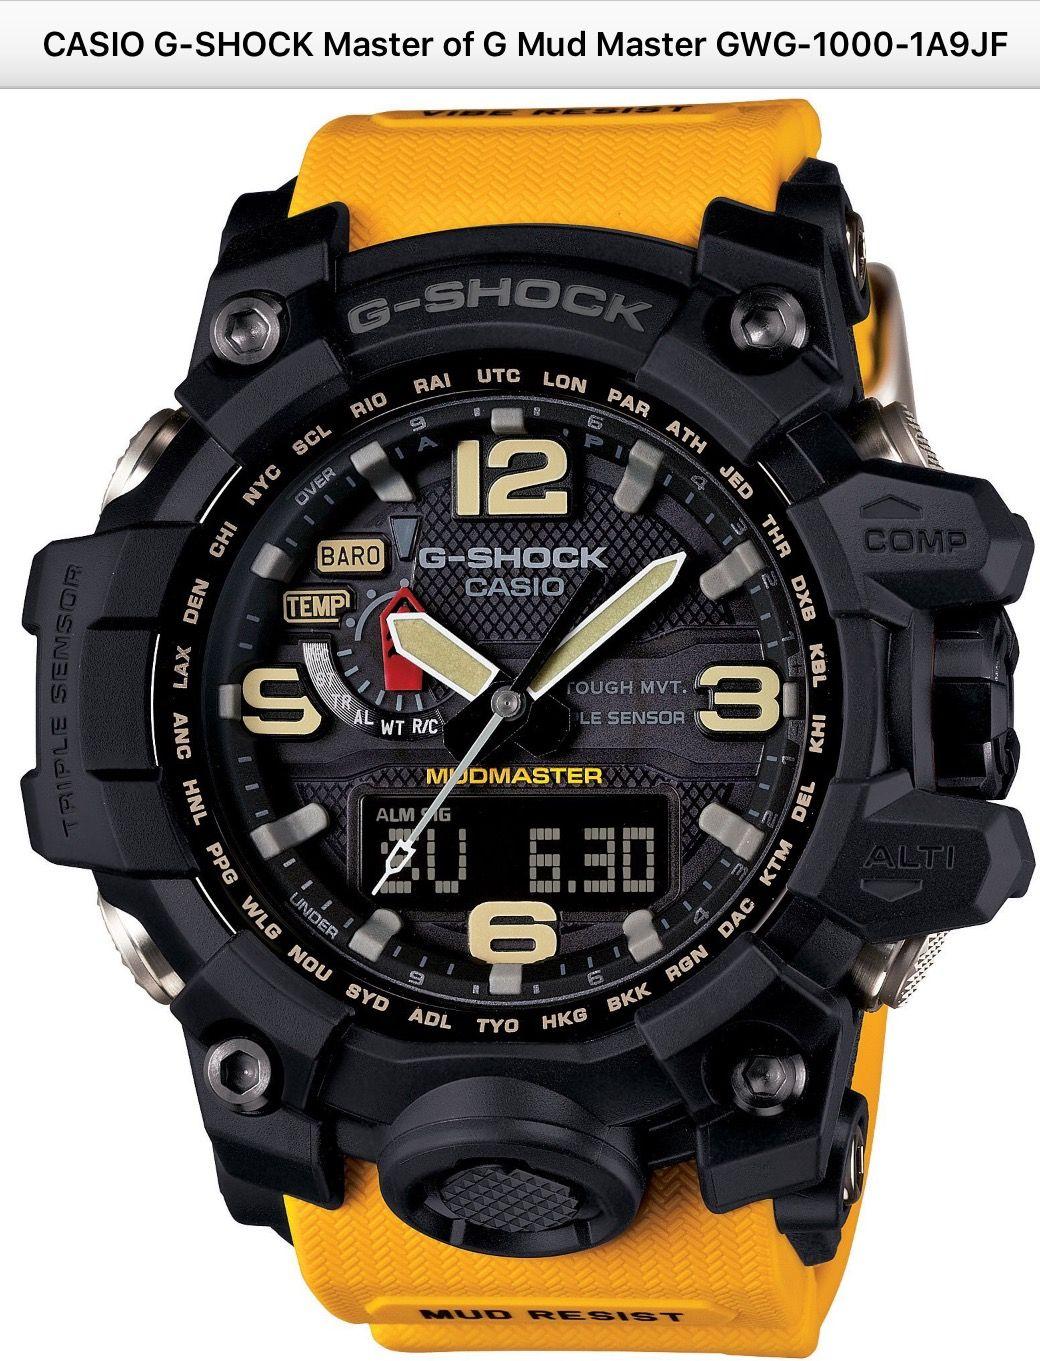 dcc17f6d3 CASIO G-SHOCK MudMaster GWG-100-1A9JF | Relojes | Reloj casio, Reloj ...